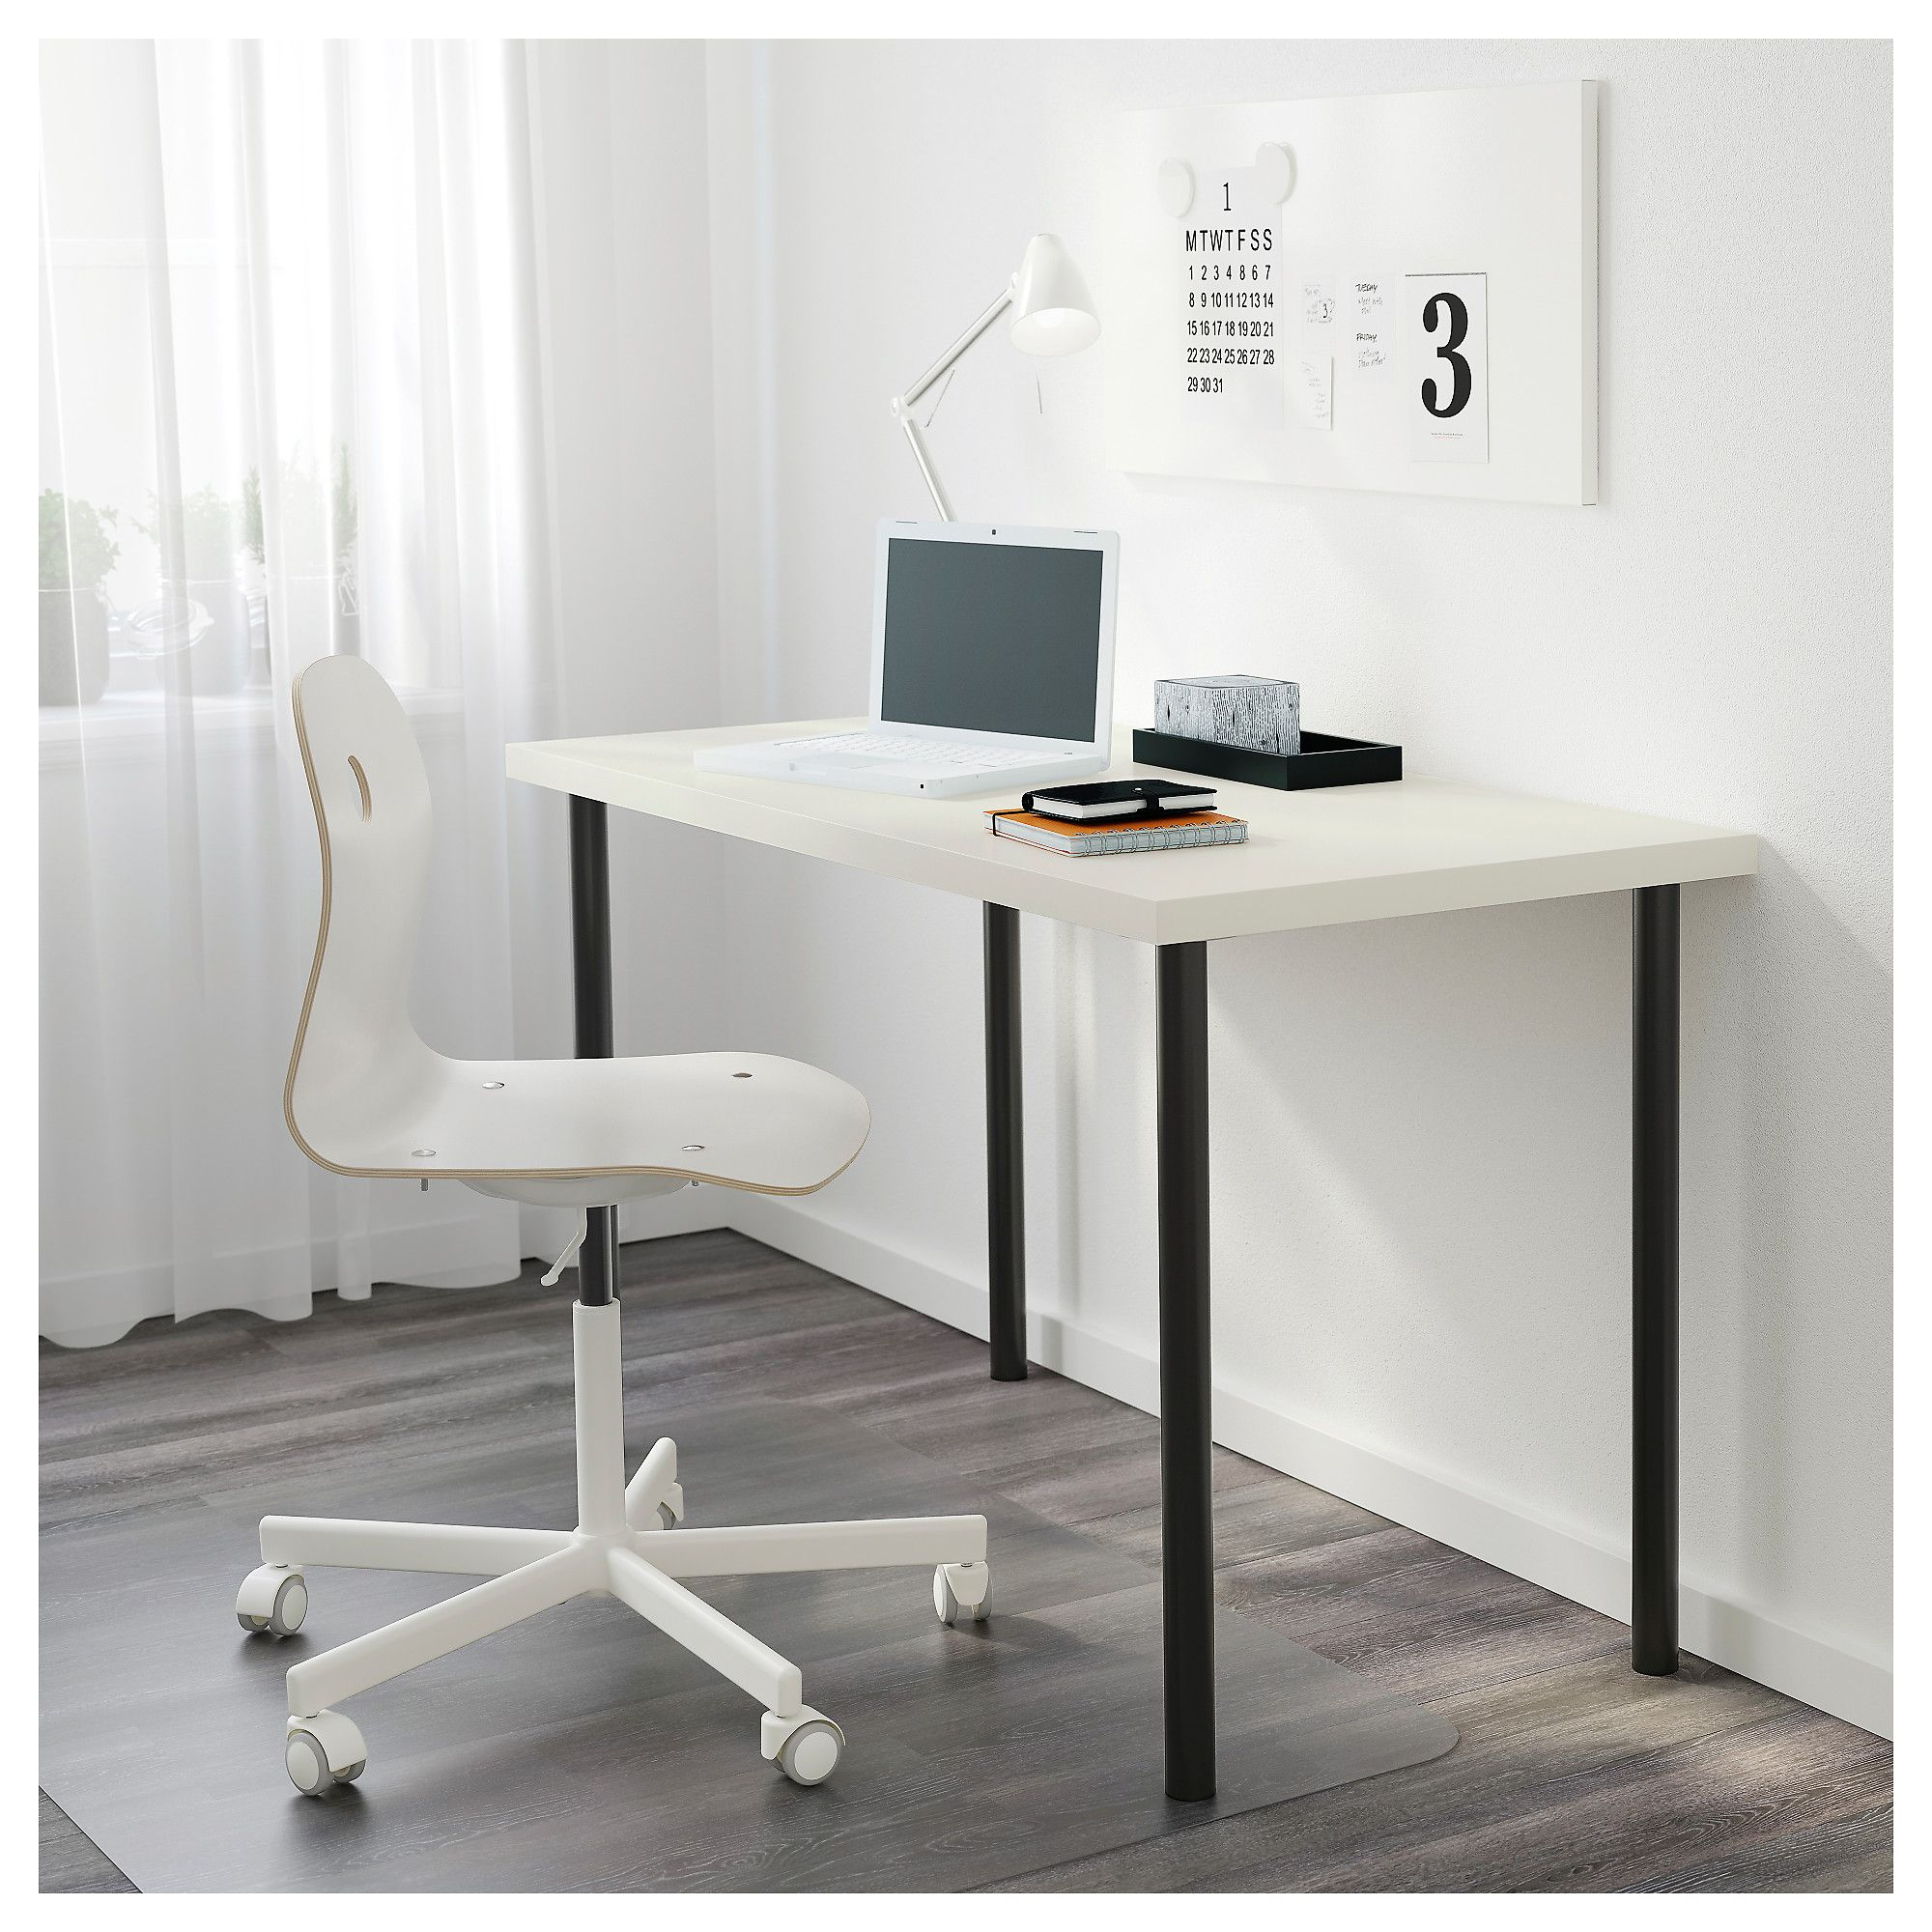 Ikea linnmon tabletop white ikea linnmon desk ikea